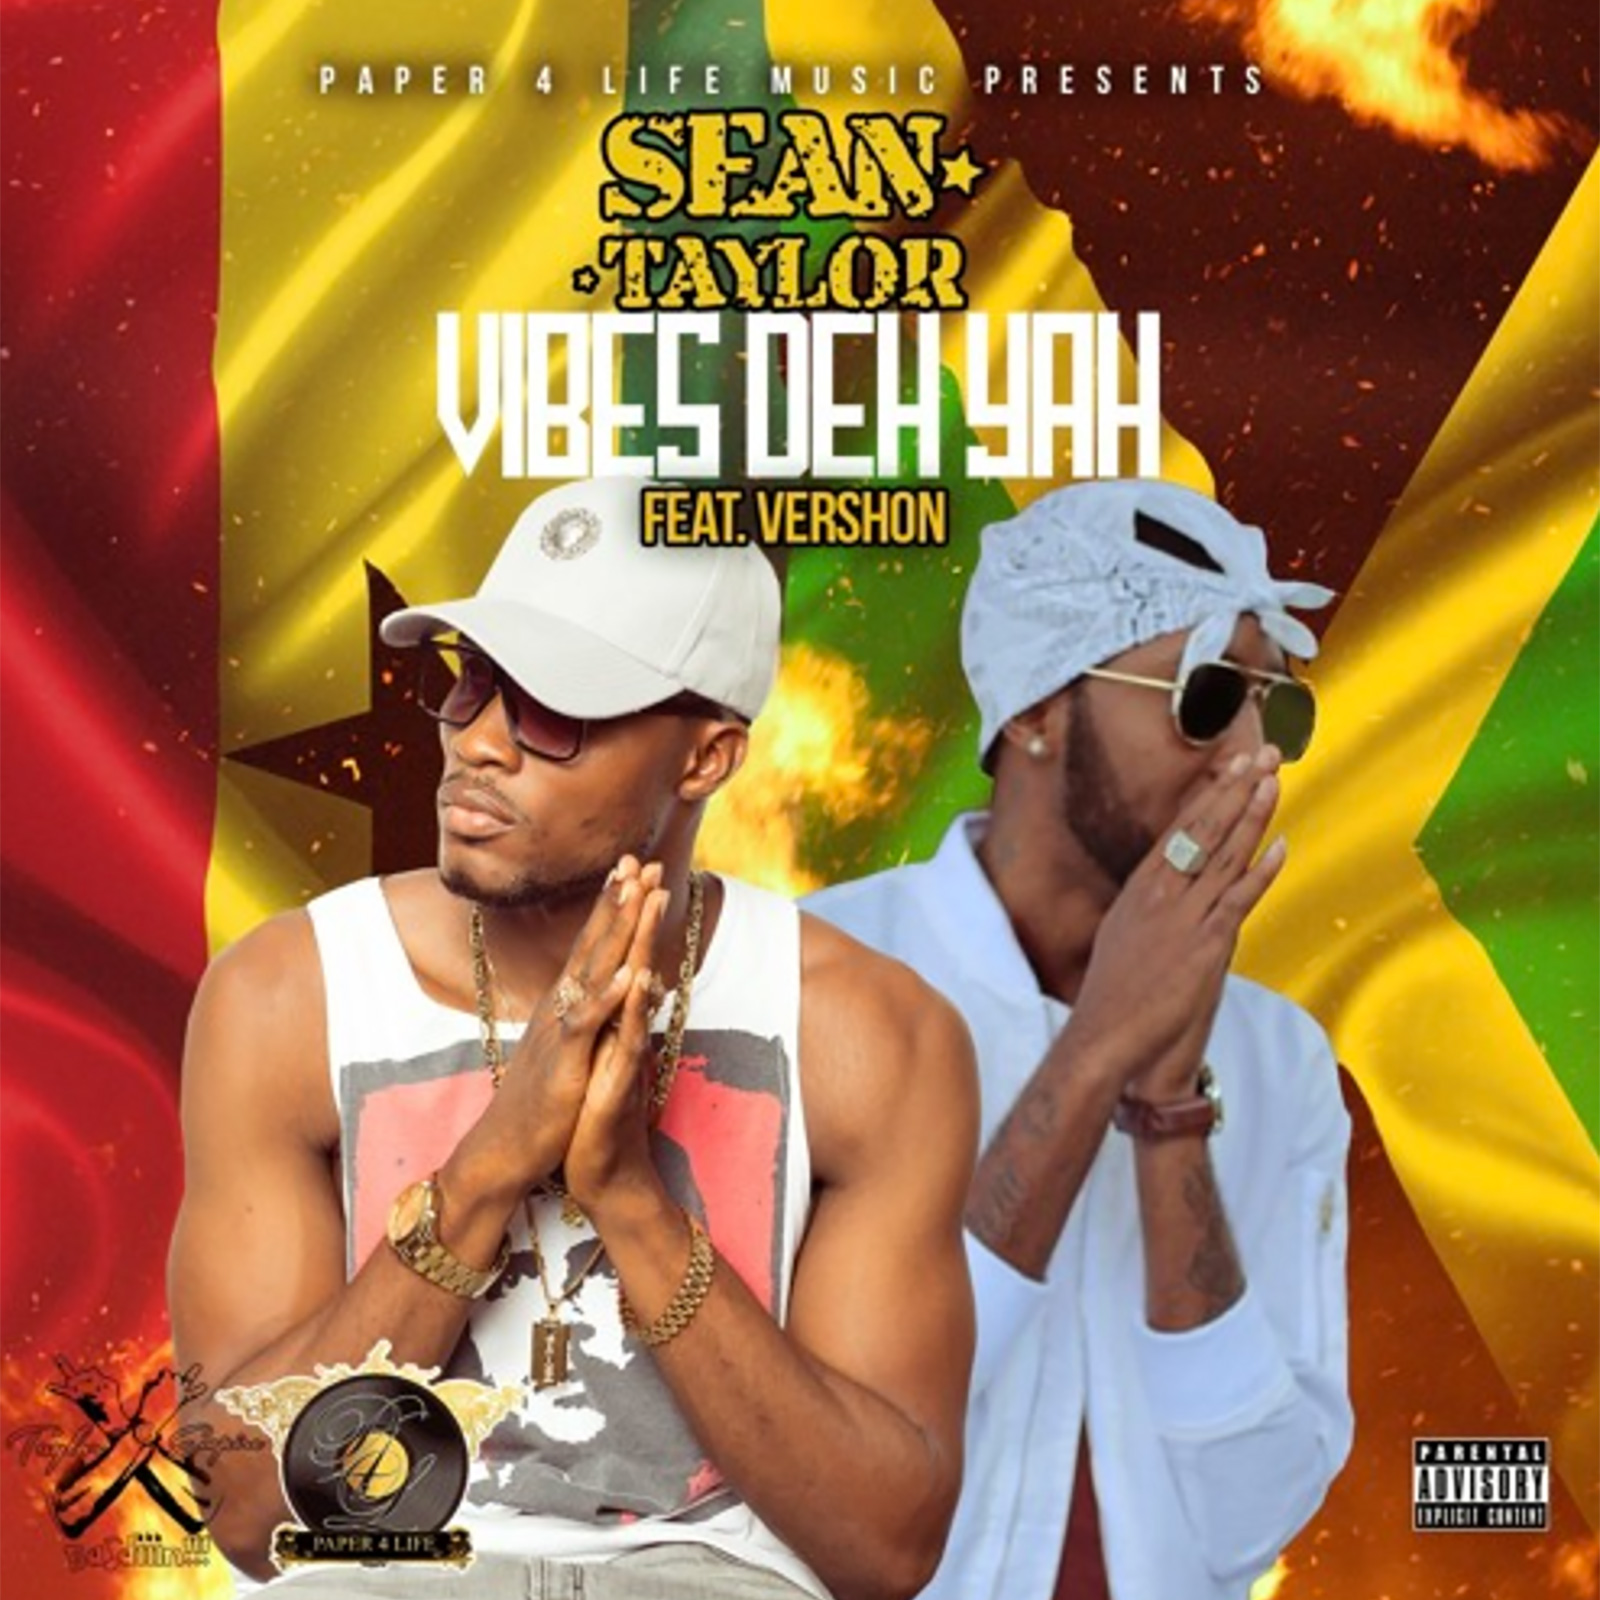 Vibes Deh Yah by Sean Taylor feat. Vershon